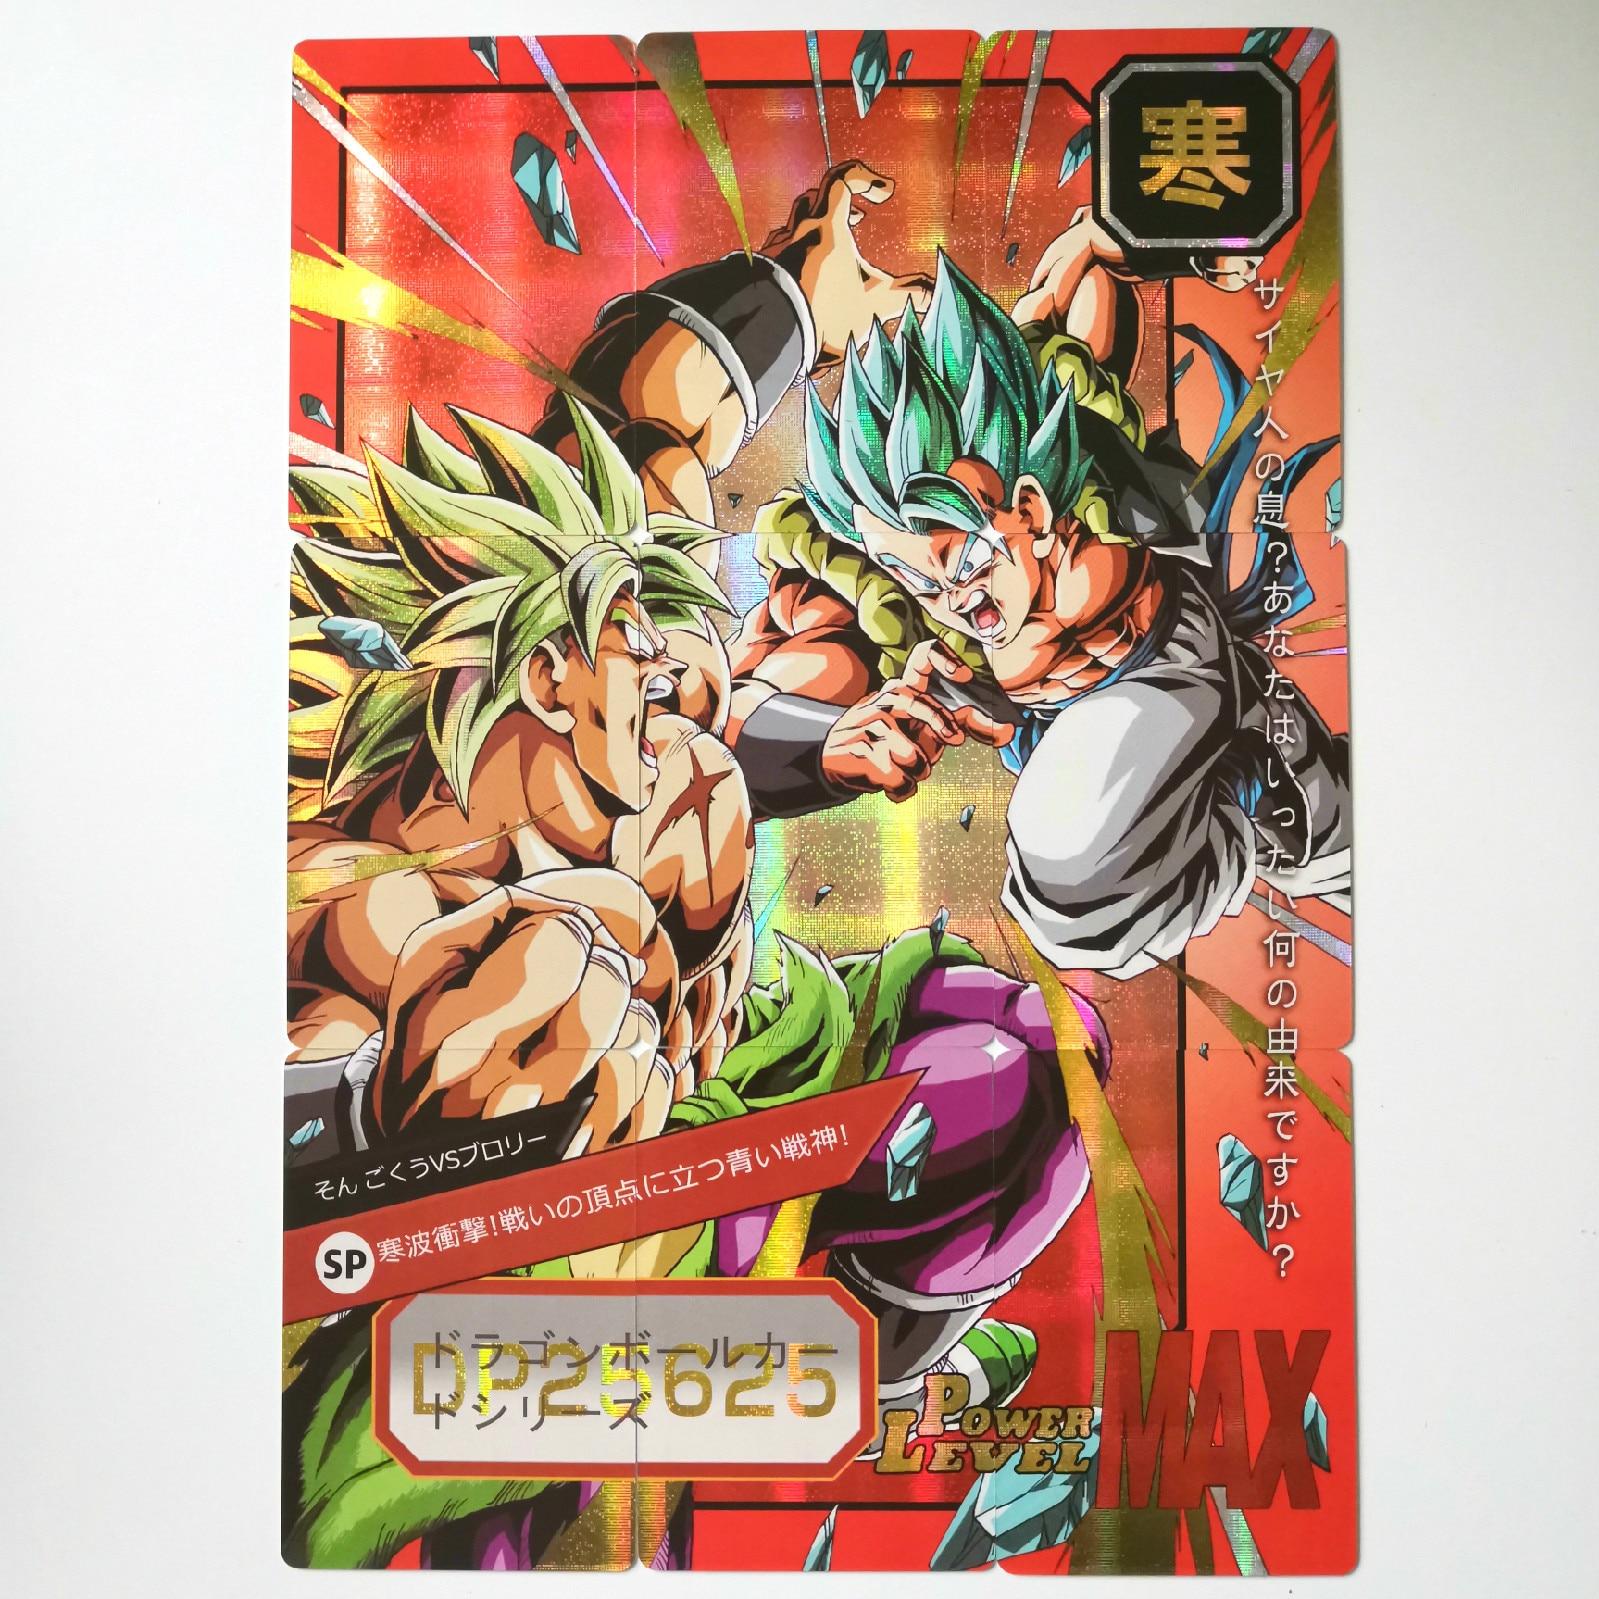 54pcs Super Dragon Ball Z 6 Sets 9 In 1 Heroes Battle Card Ultra Instinct Goku Vegeta Super Game Collection Cards